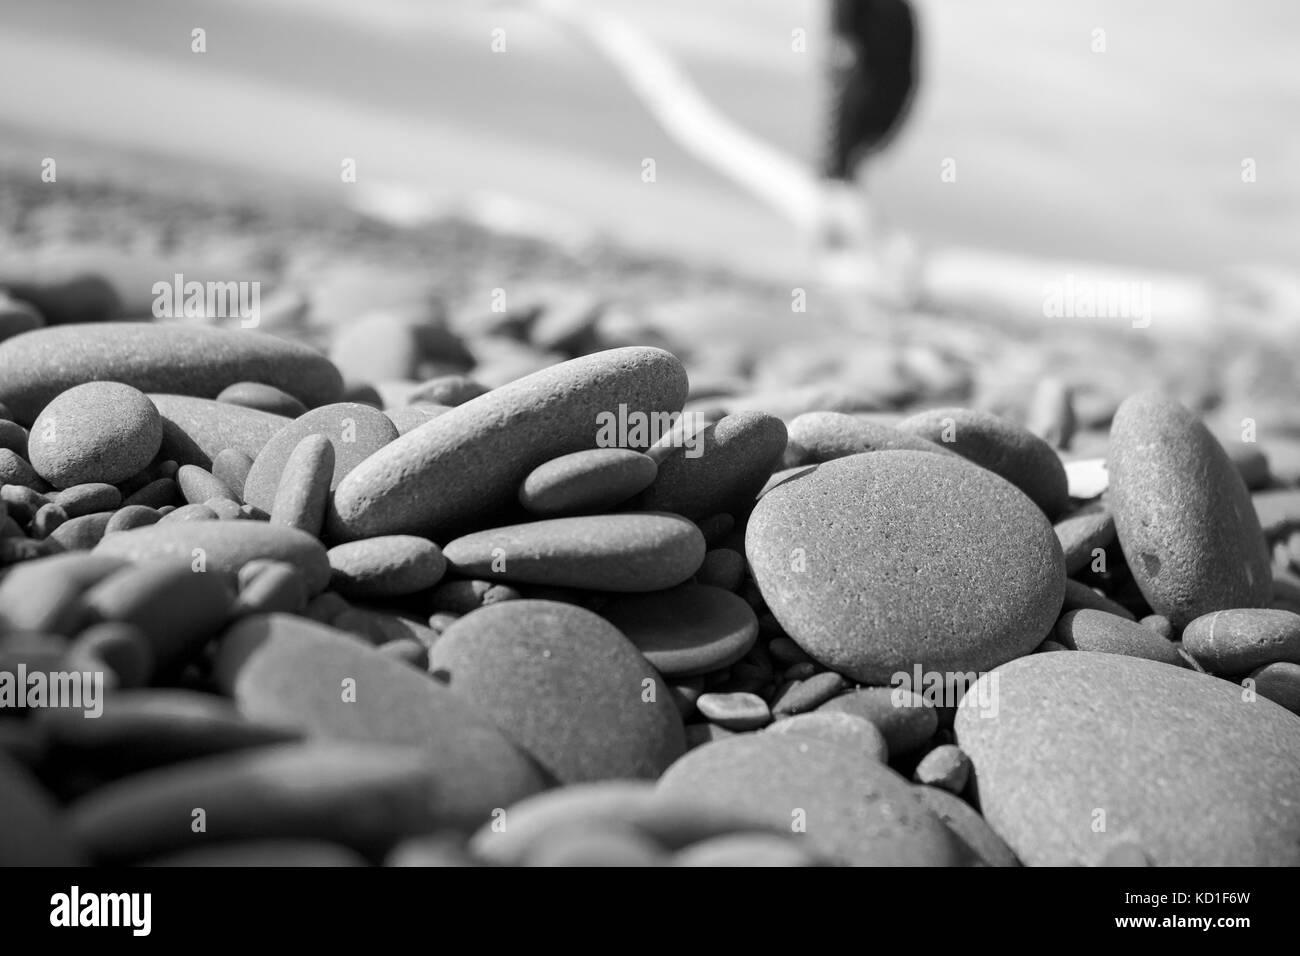 Stones on beach, New Zealand - Stock Image